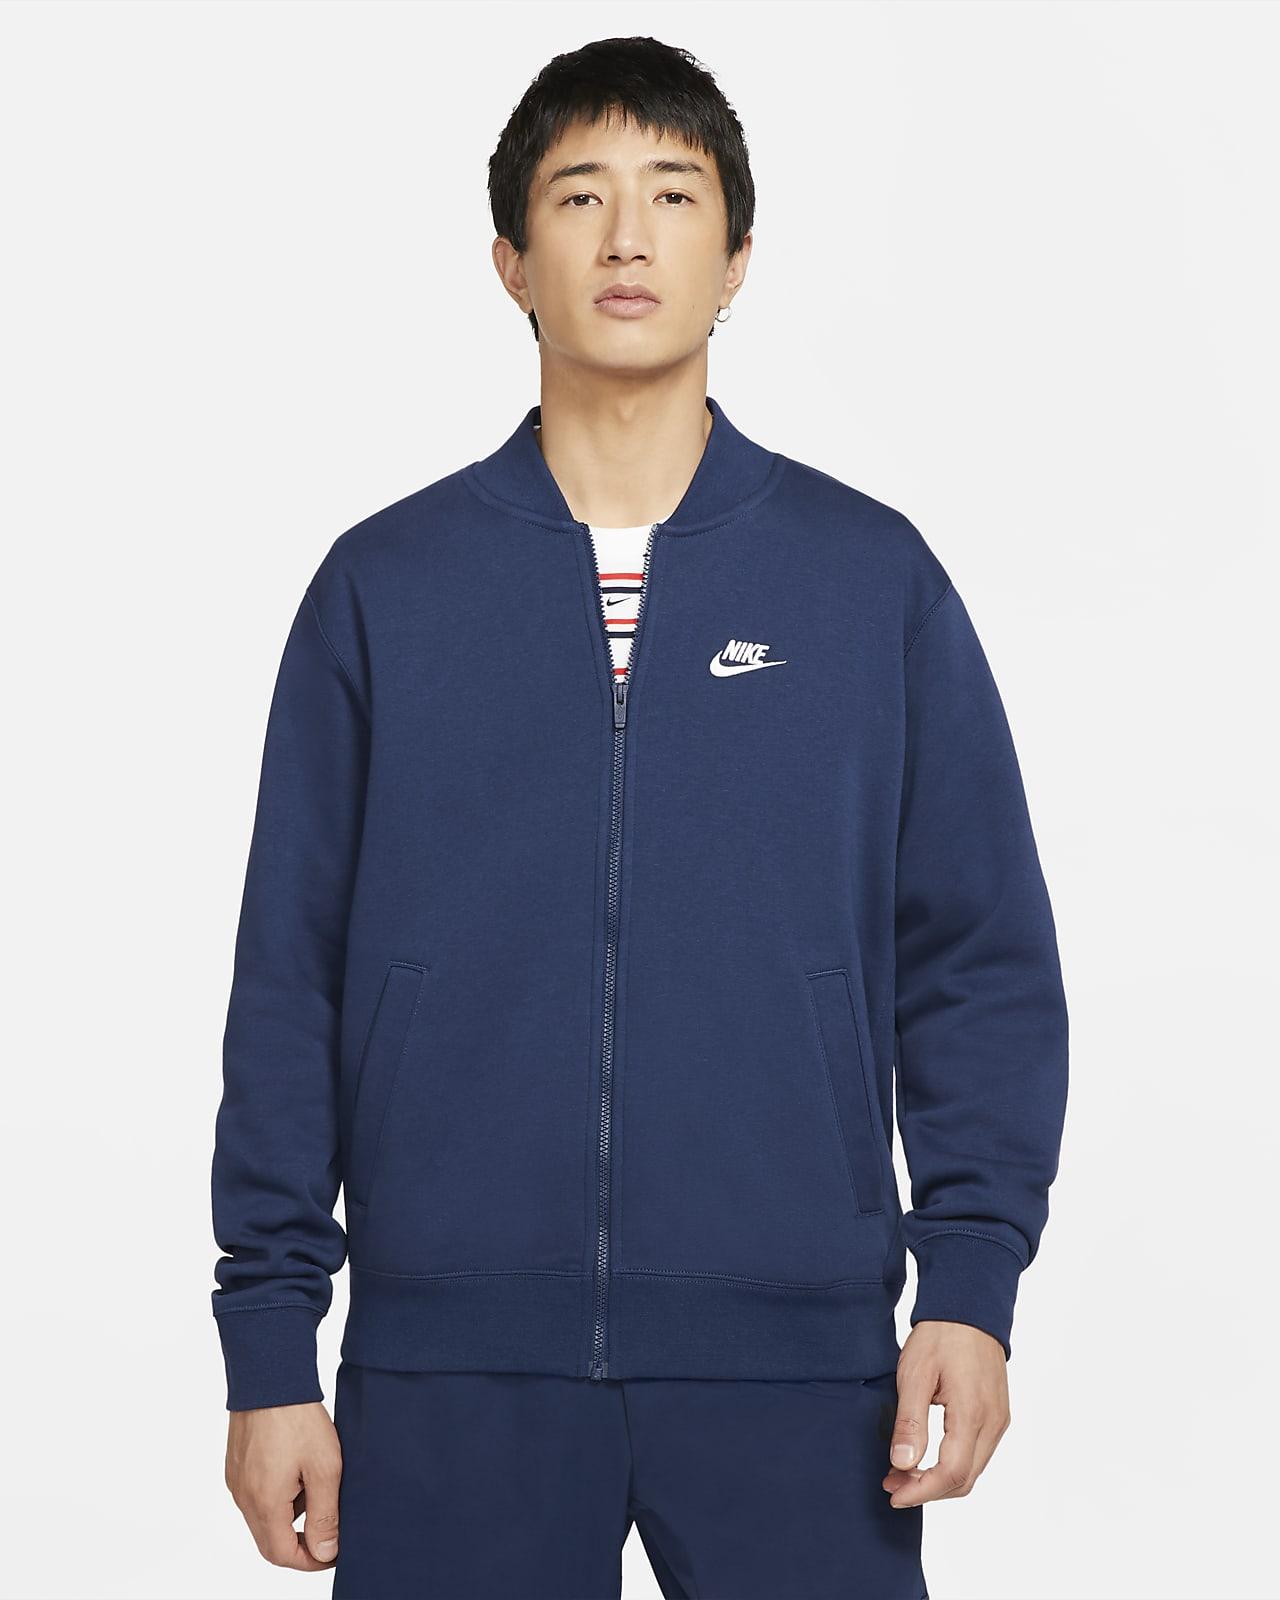 Męska kurtka typu bomberka Nike Sportswear Club Fleece